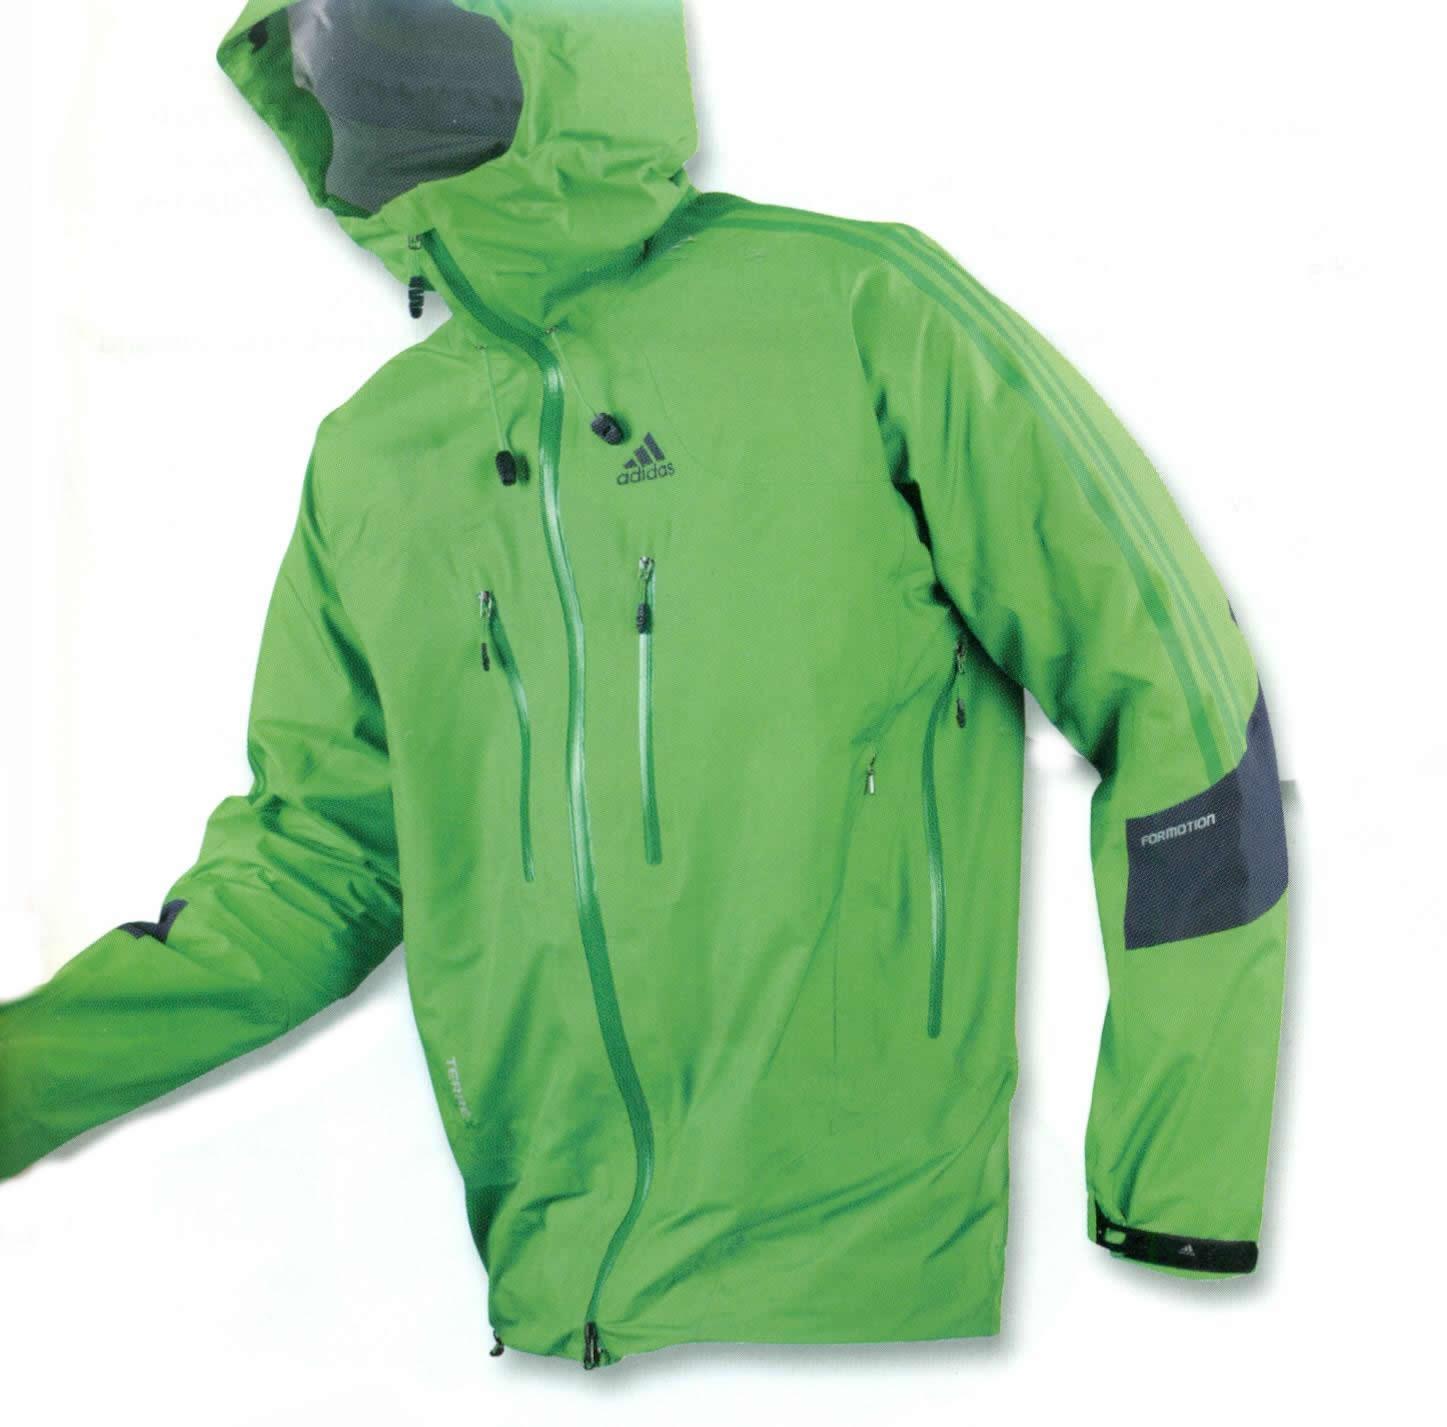 Adidas: Terrex Feather Jacket